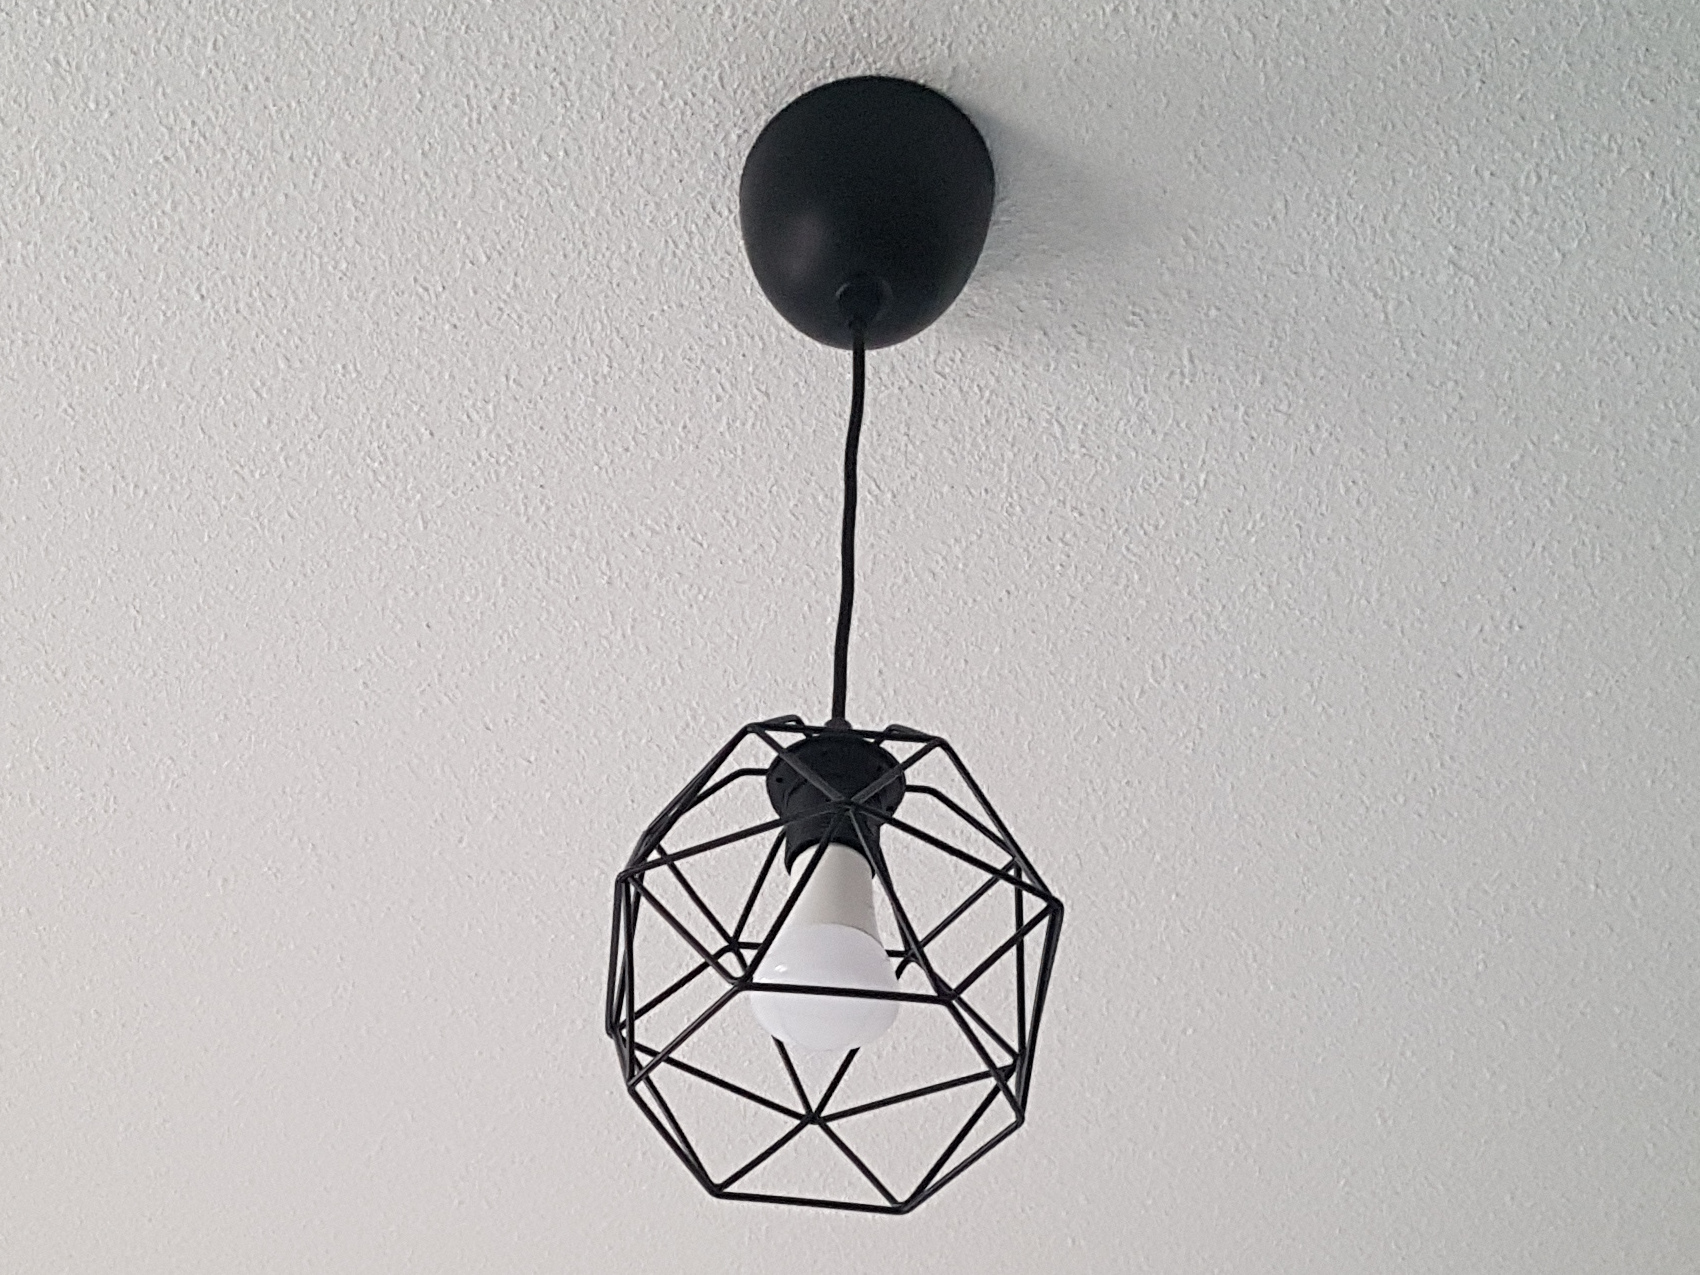 Hue Lamp Slaapkamer